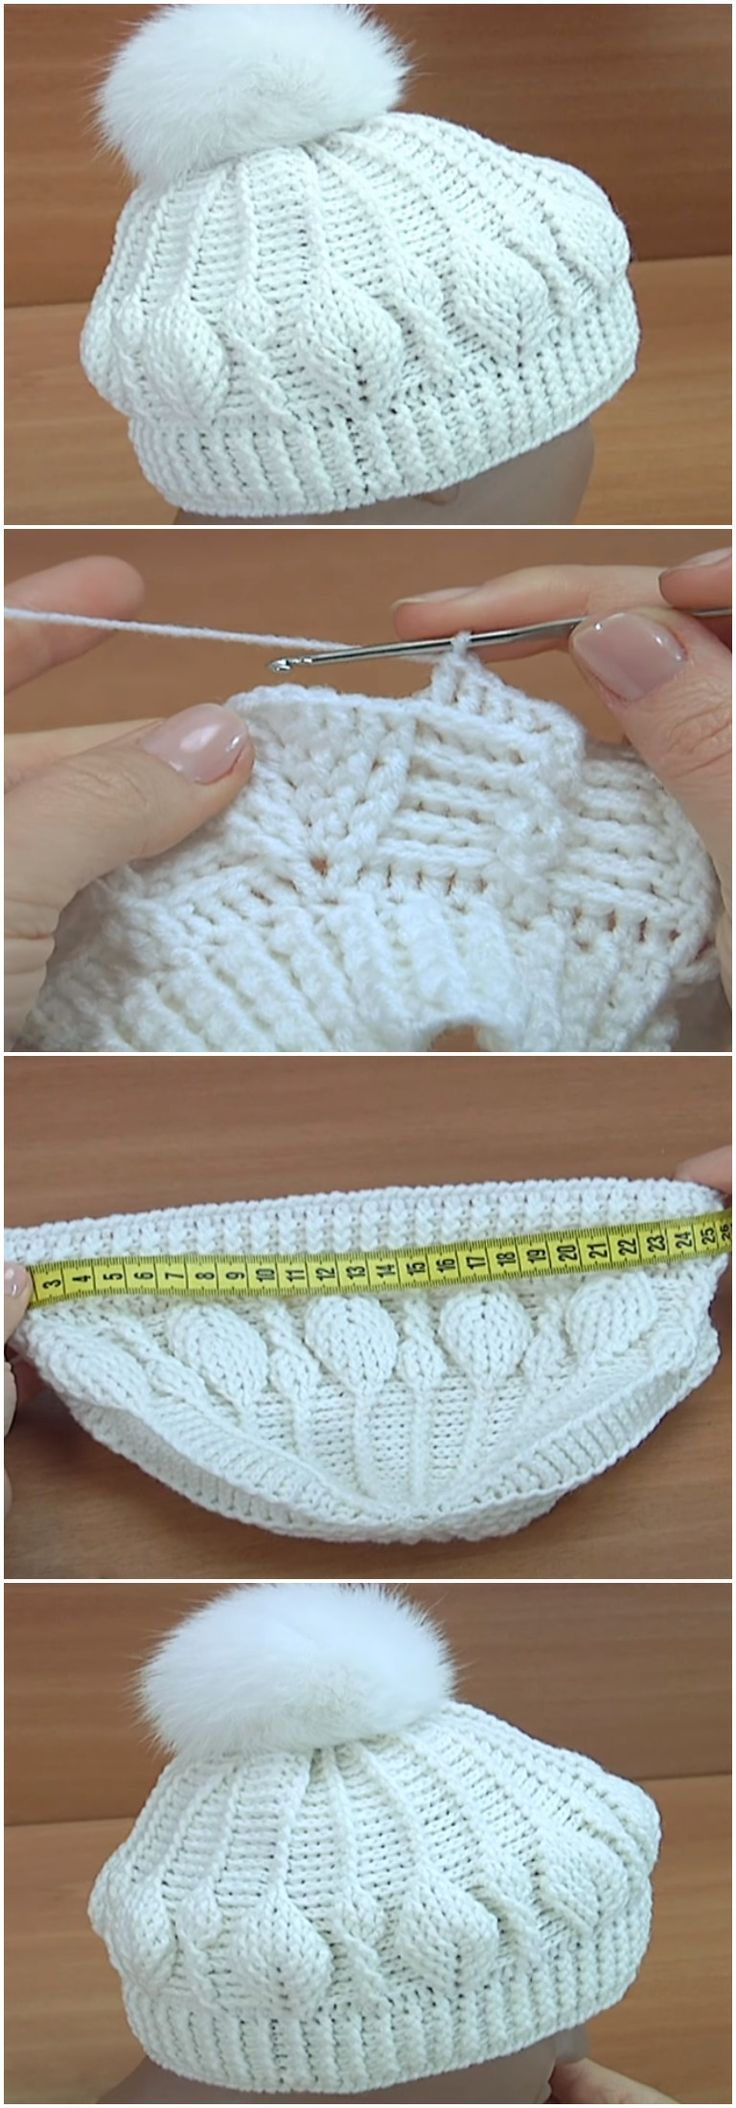 Crochet 3D Beanie Hat Leaf Stitch